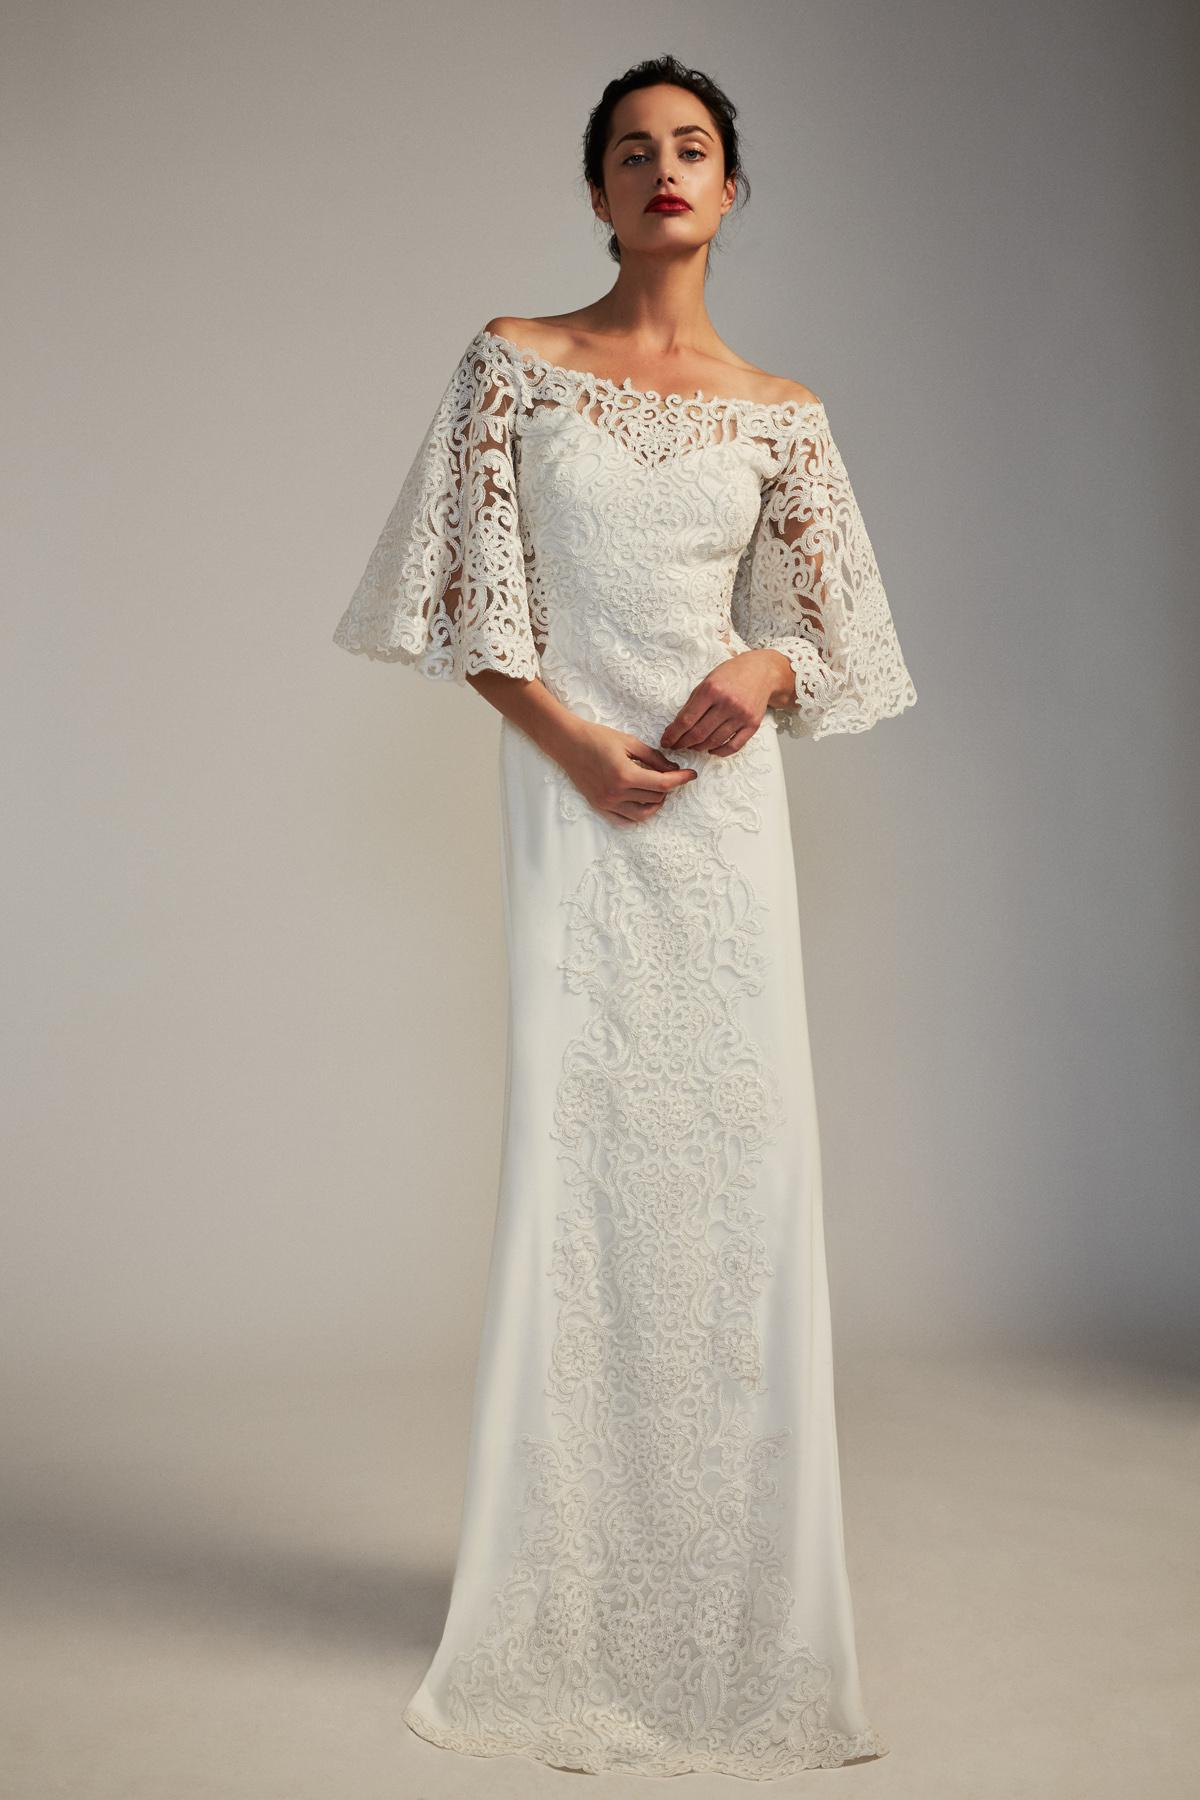 Lyst - Tadashi Shoji Clancy Gown in White